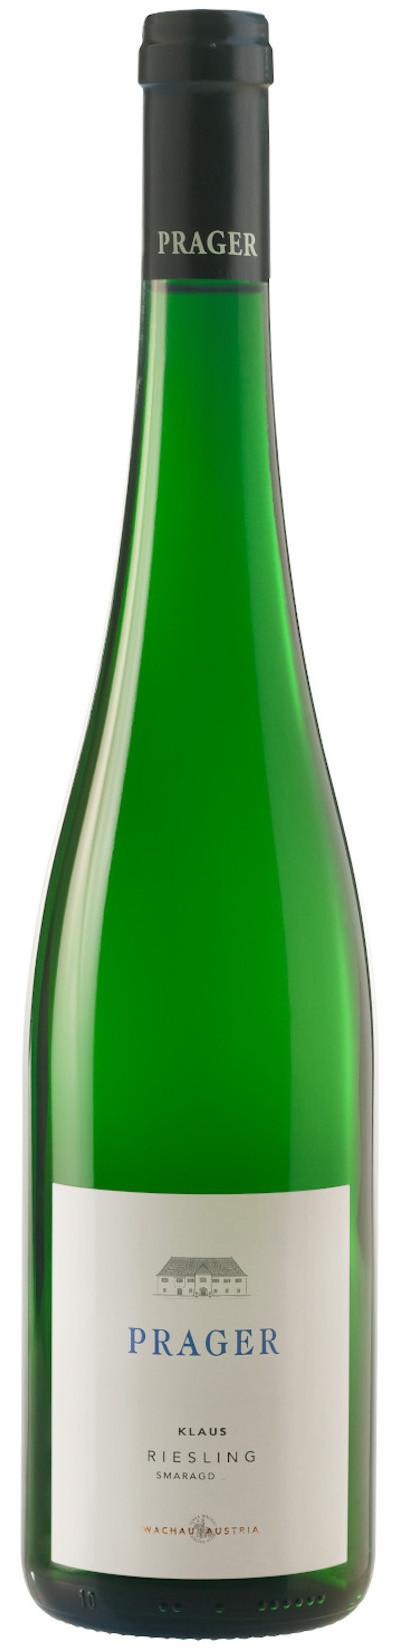 Prager - Rarität Riesling Smaragd Klaus